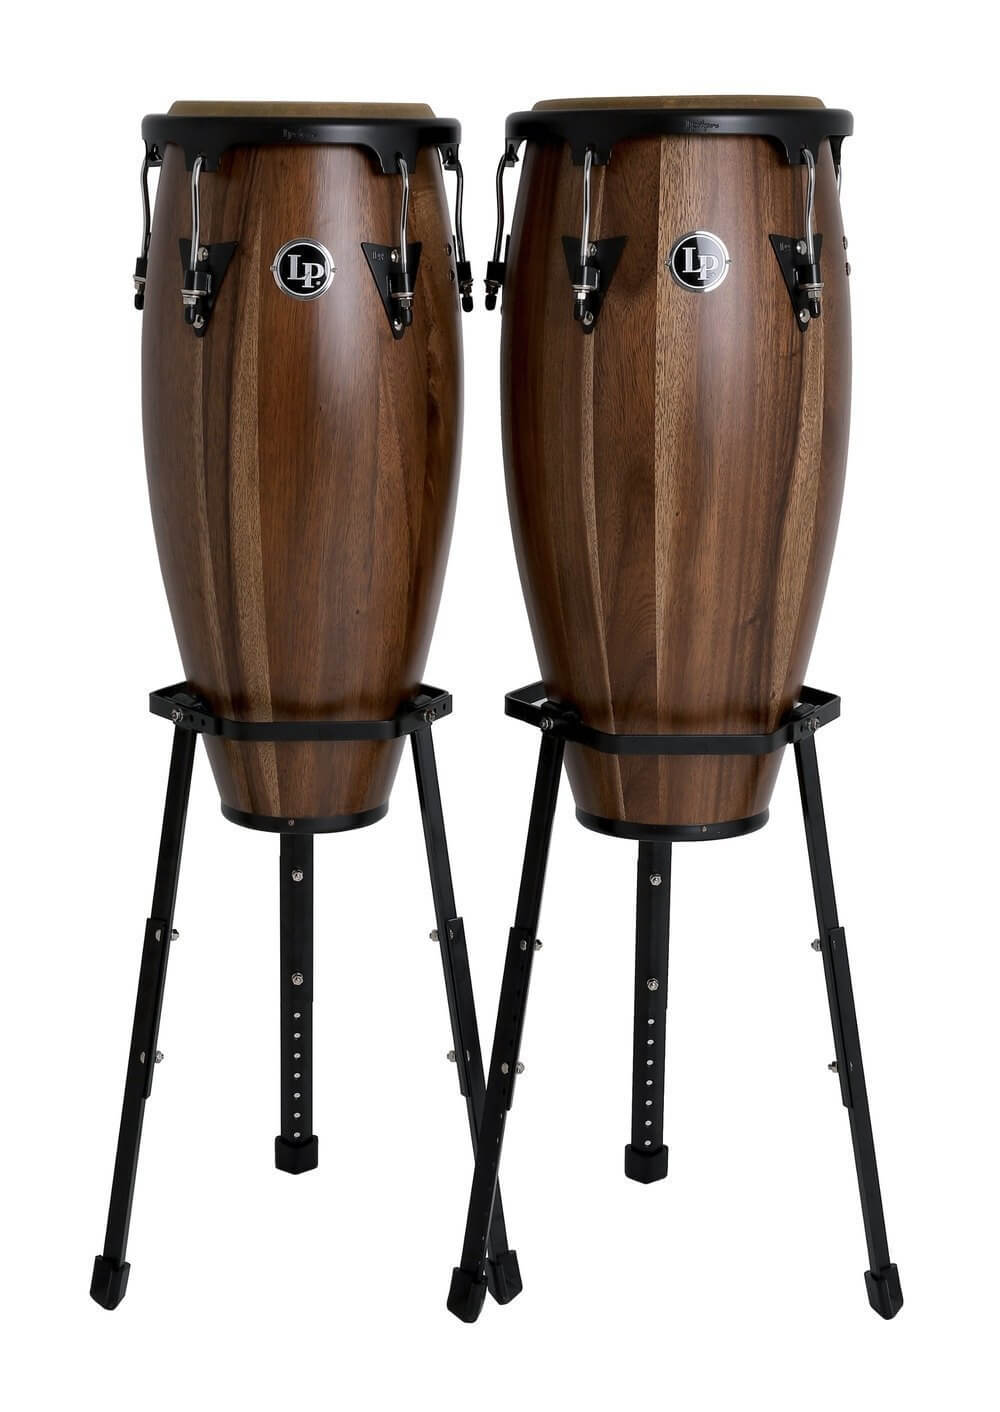 Set Congas Latin Percussion Lpa647B 10